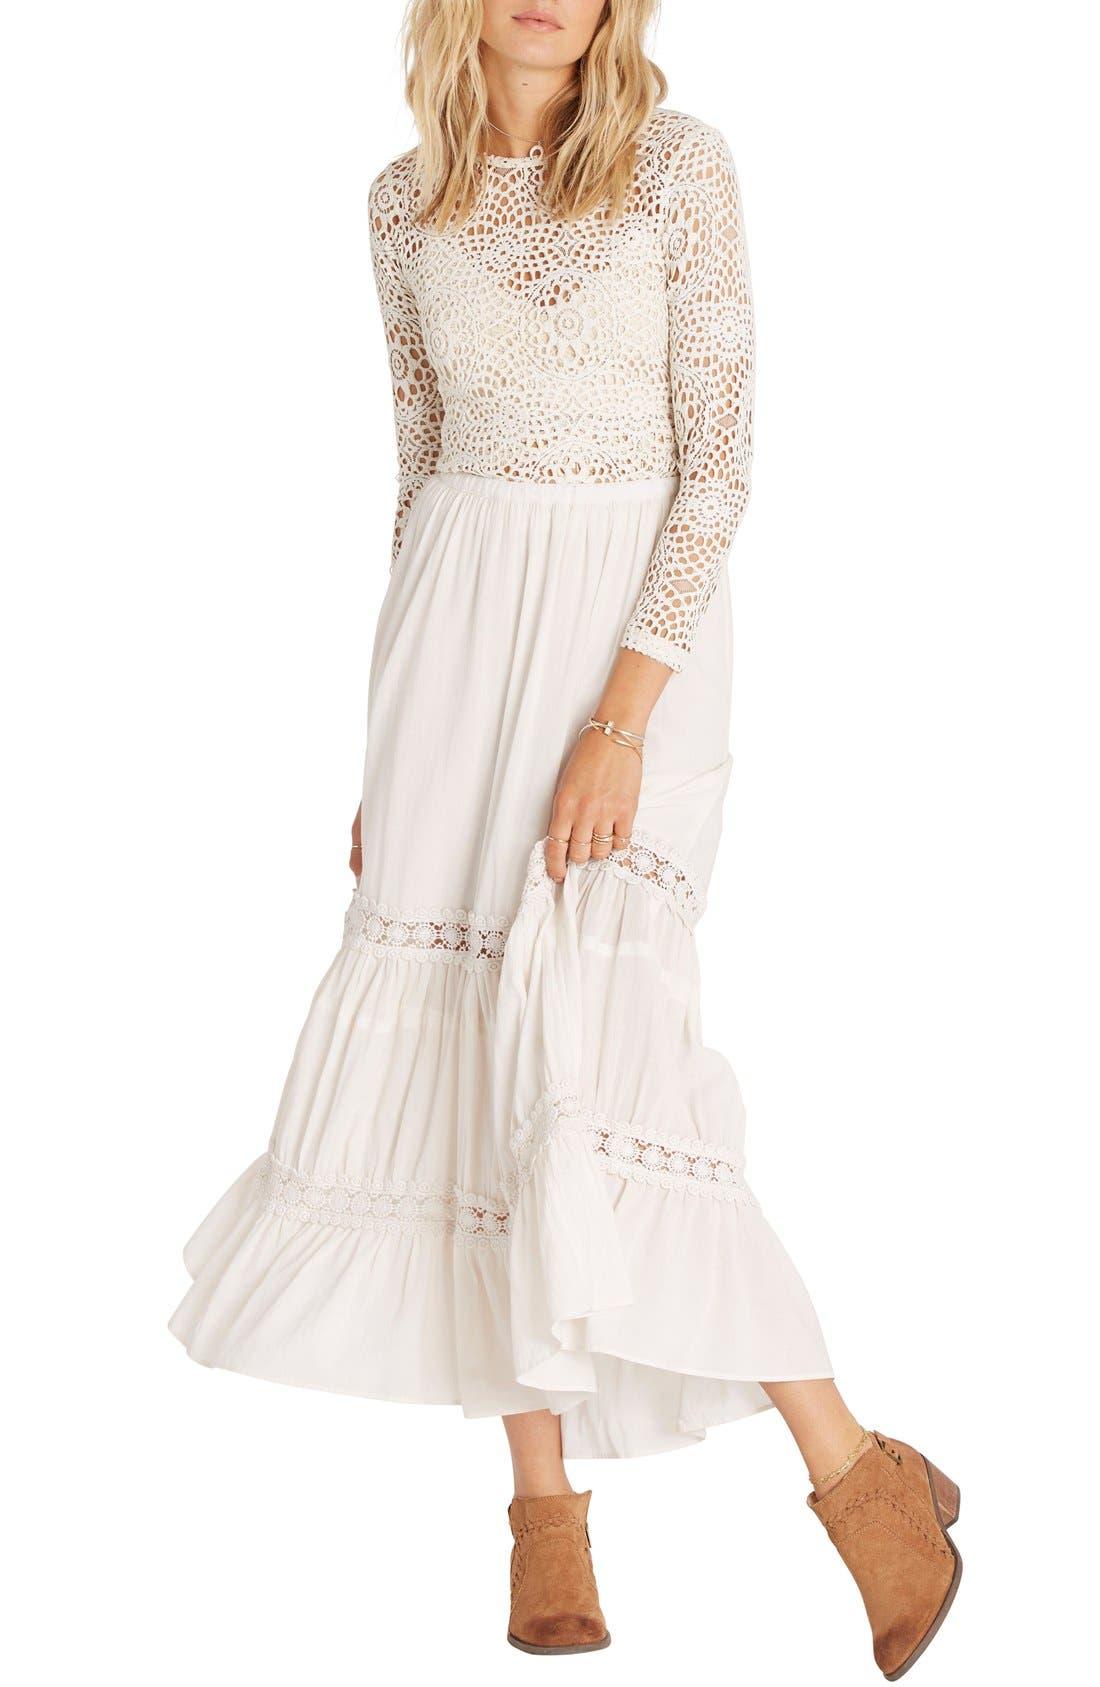 Alternate Image 1 Selected - Billabong Til the Moment Tiered Maxi Skirt